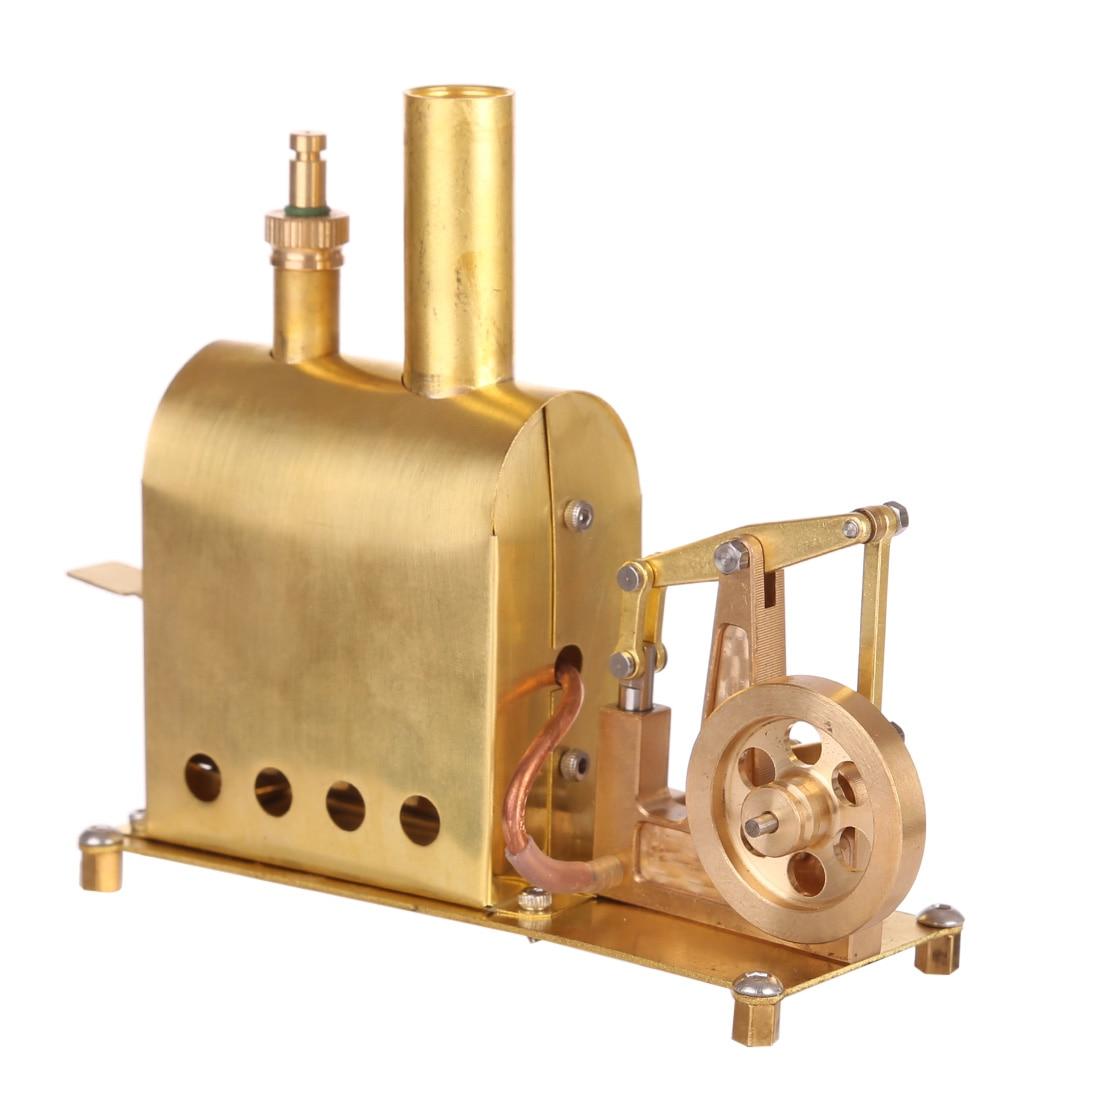 11.3 X 4.5 X 10CM Mini Pure Copper Steam Engine Model With Boiler Creative Gift Set